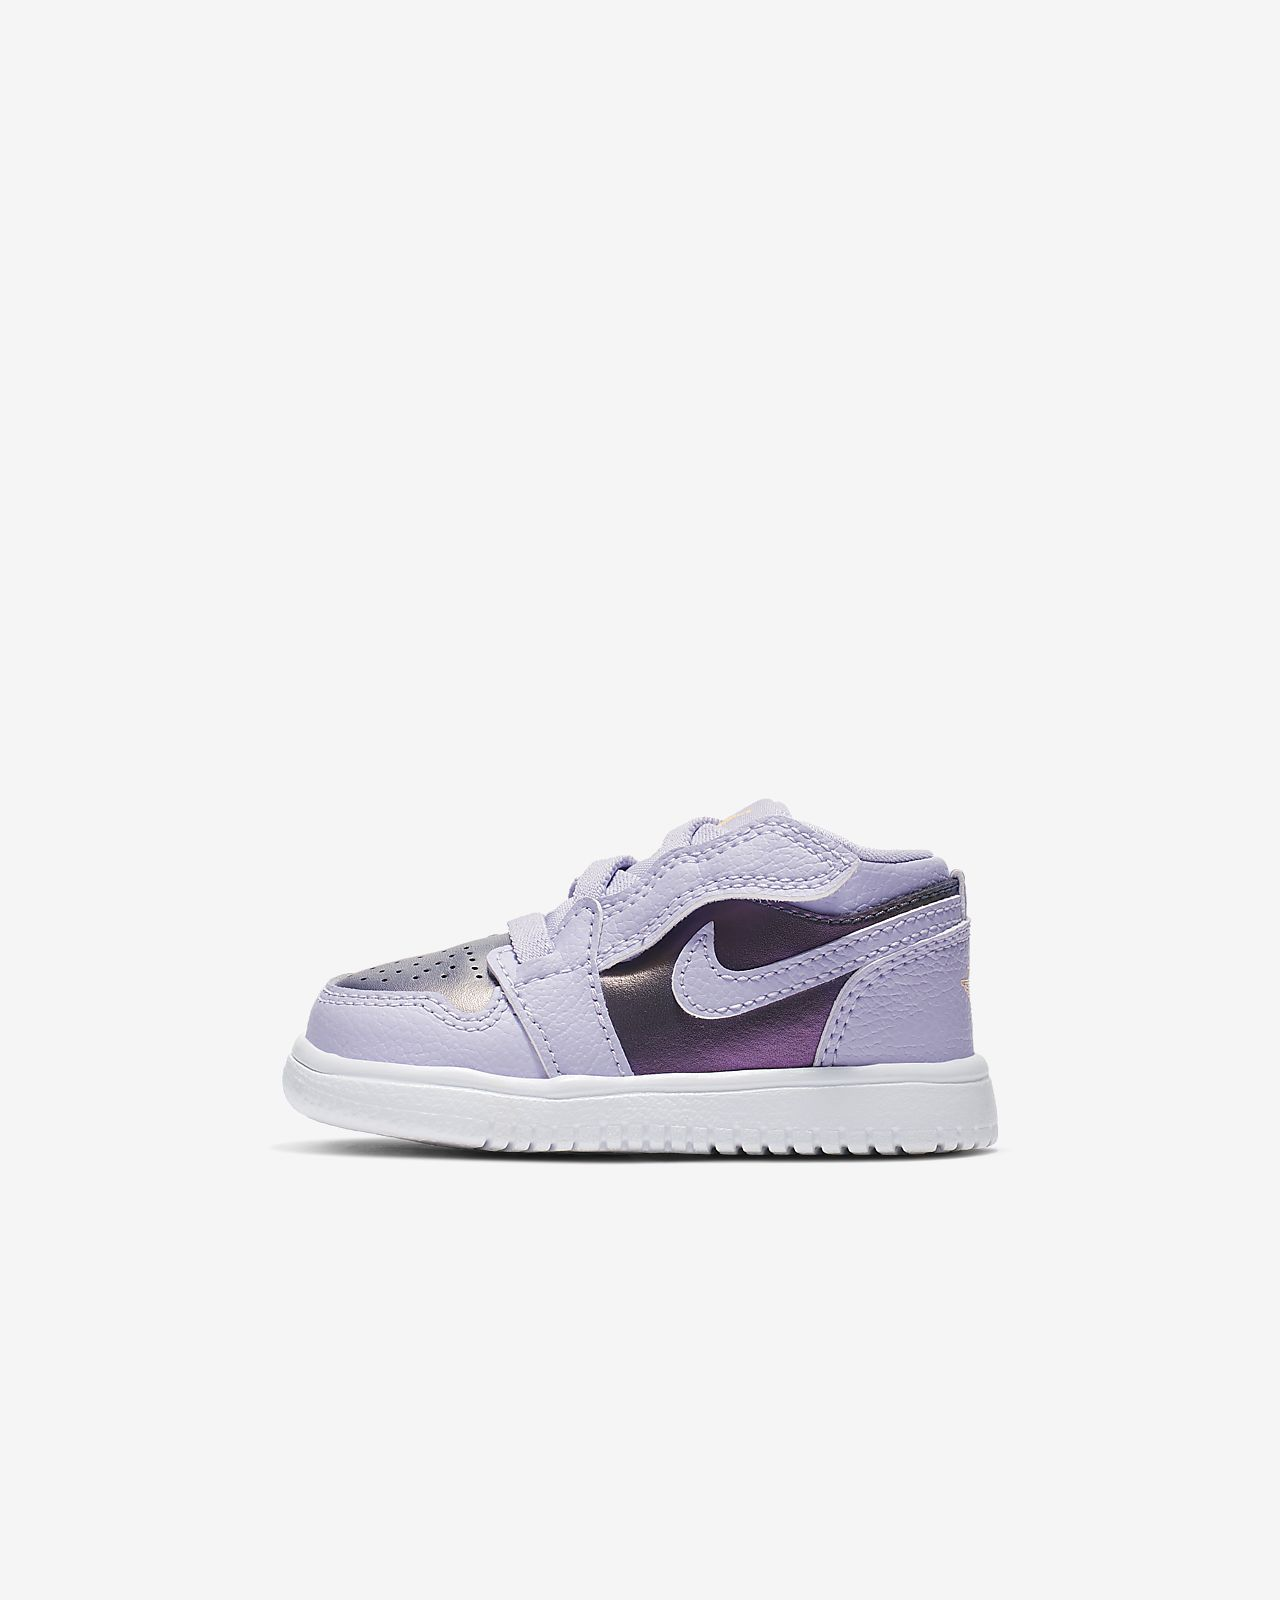 03671b635c40 Jordan 1 Low Alt Baby Toddler Shoe. Nike.com